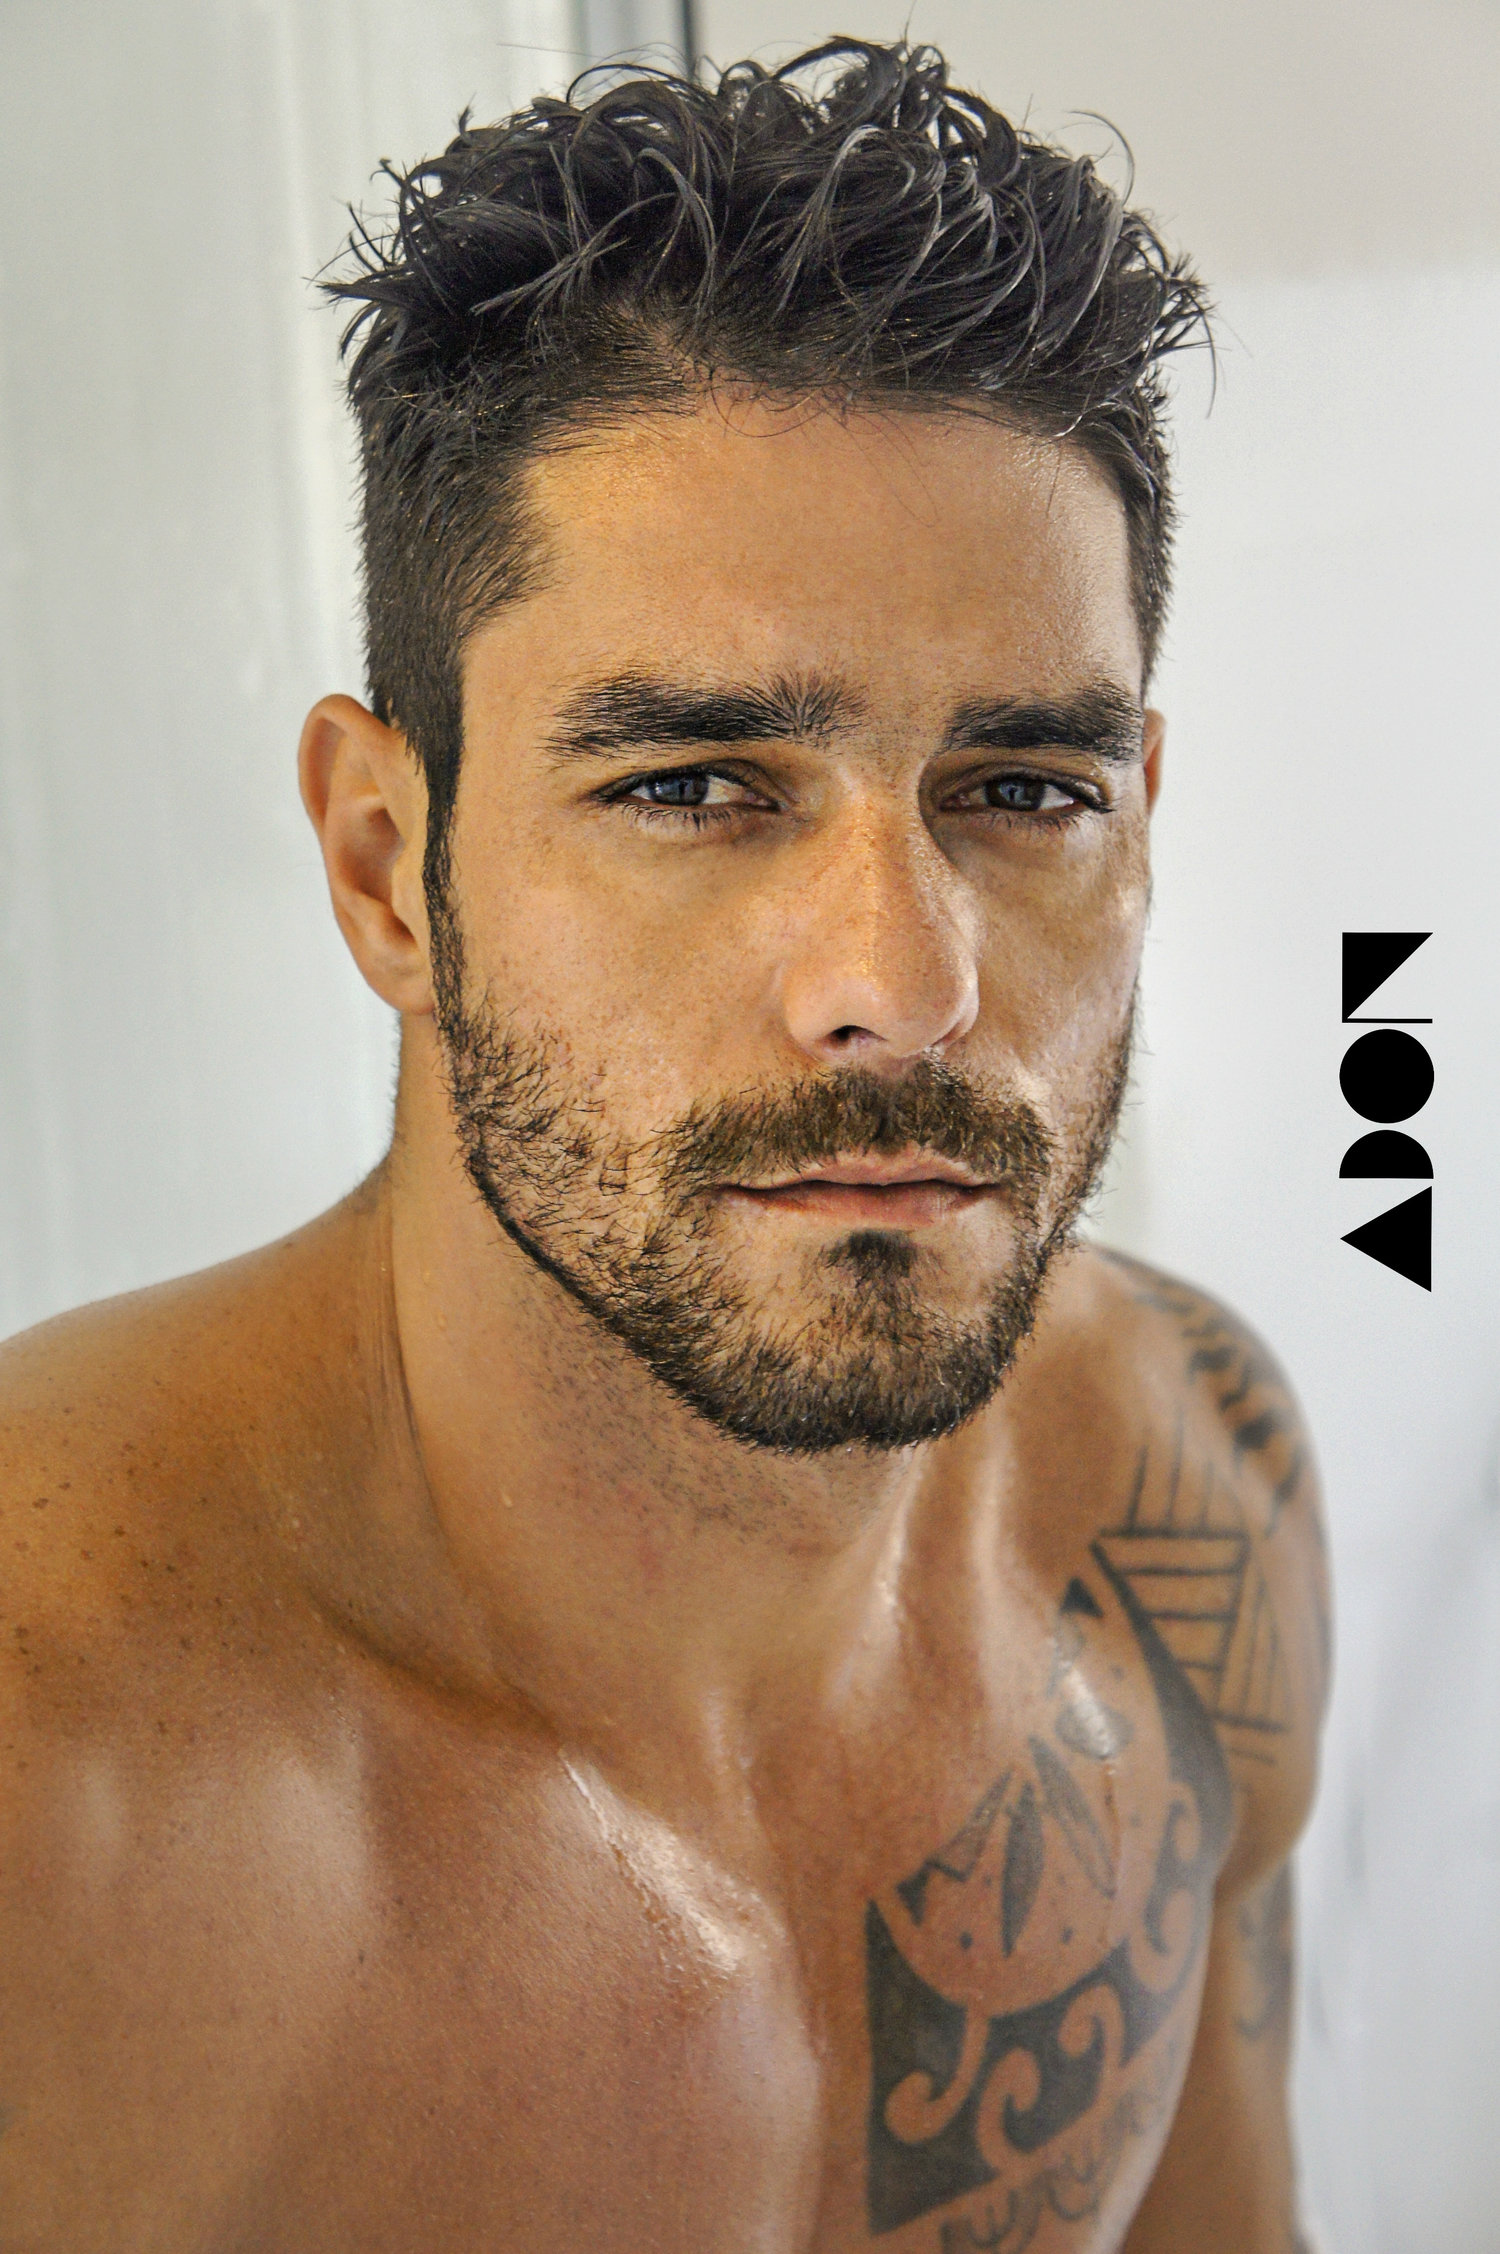 Adon Exclusive: Model Diego Grossi By Mattheus Lian